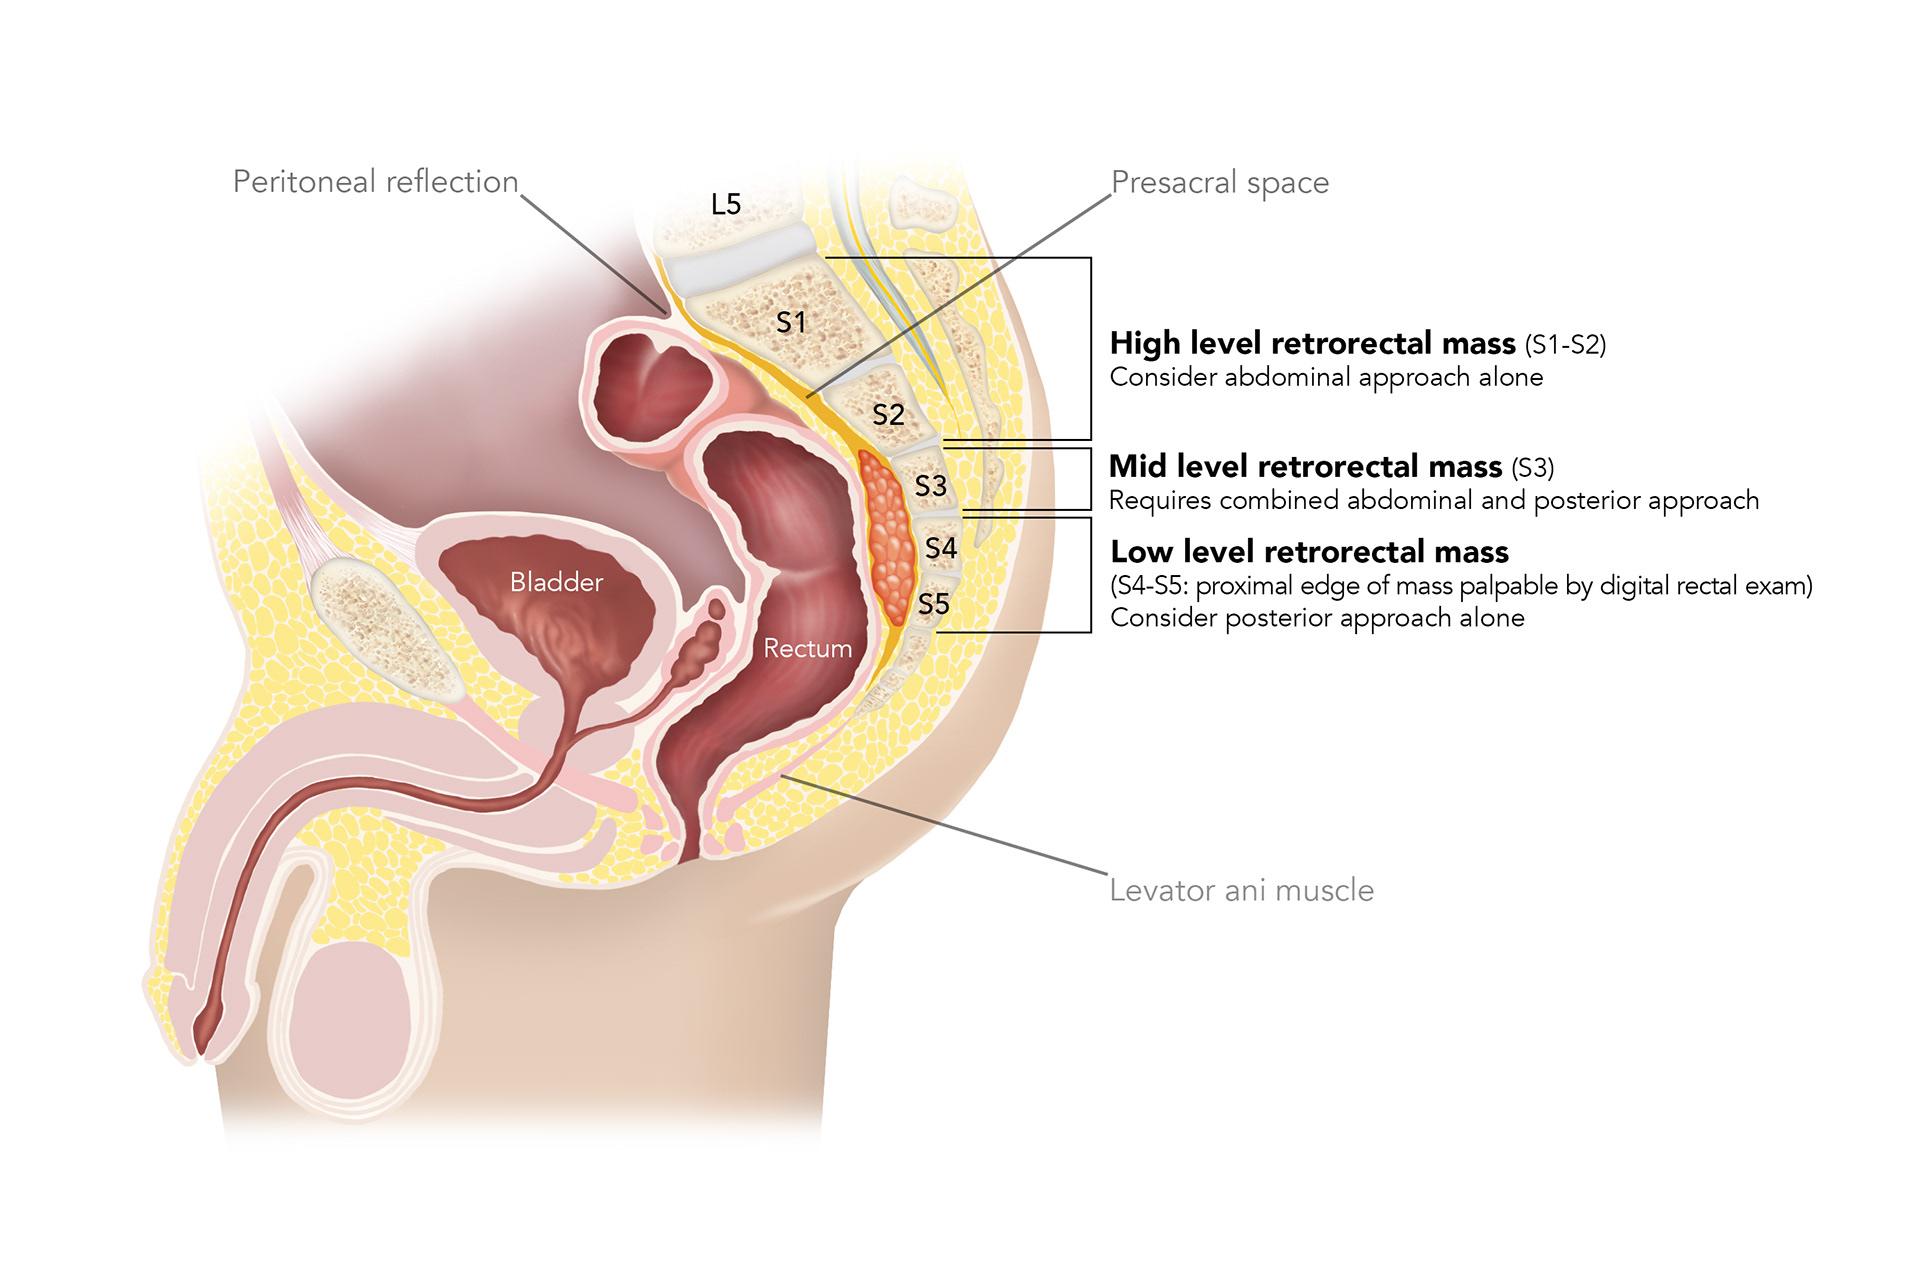 yuko tonohira - Medical illustration (academic)